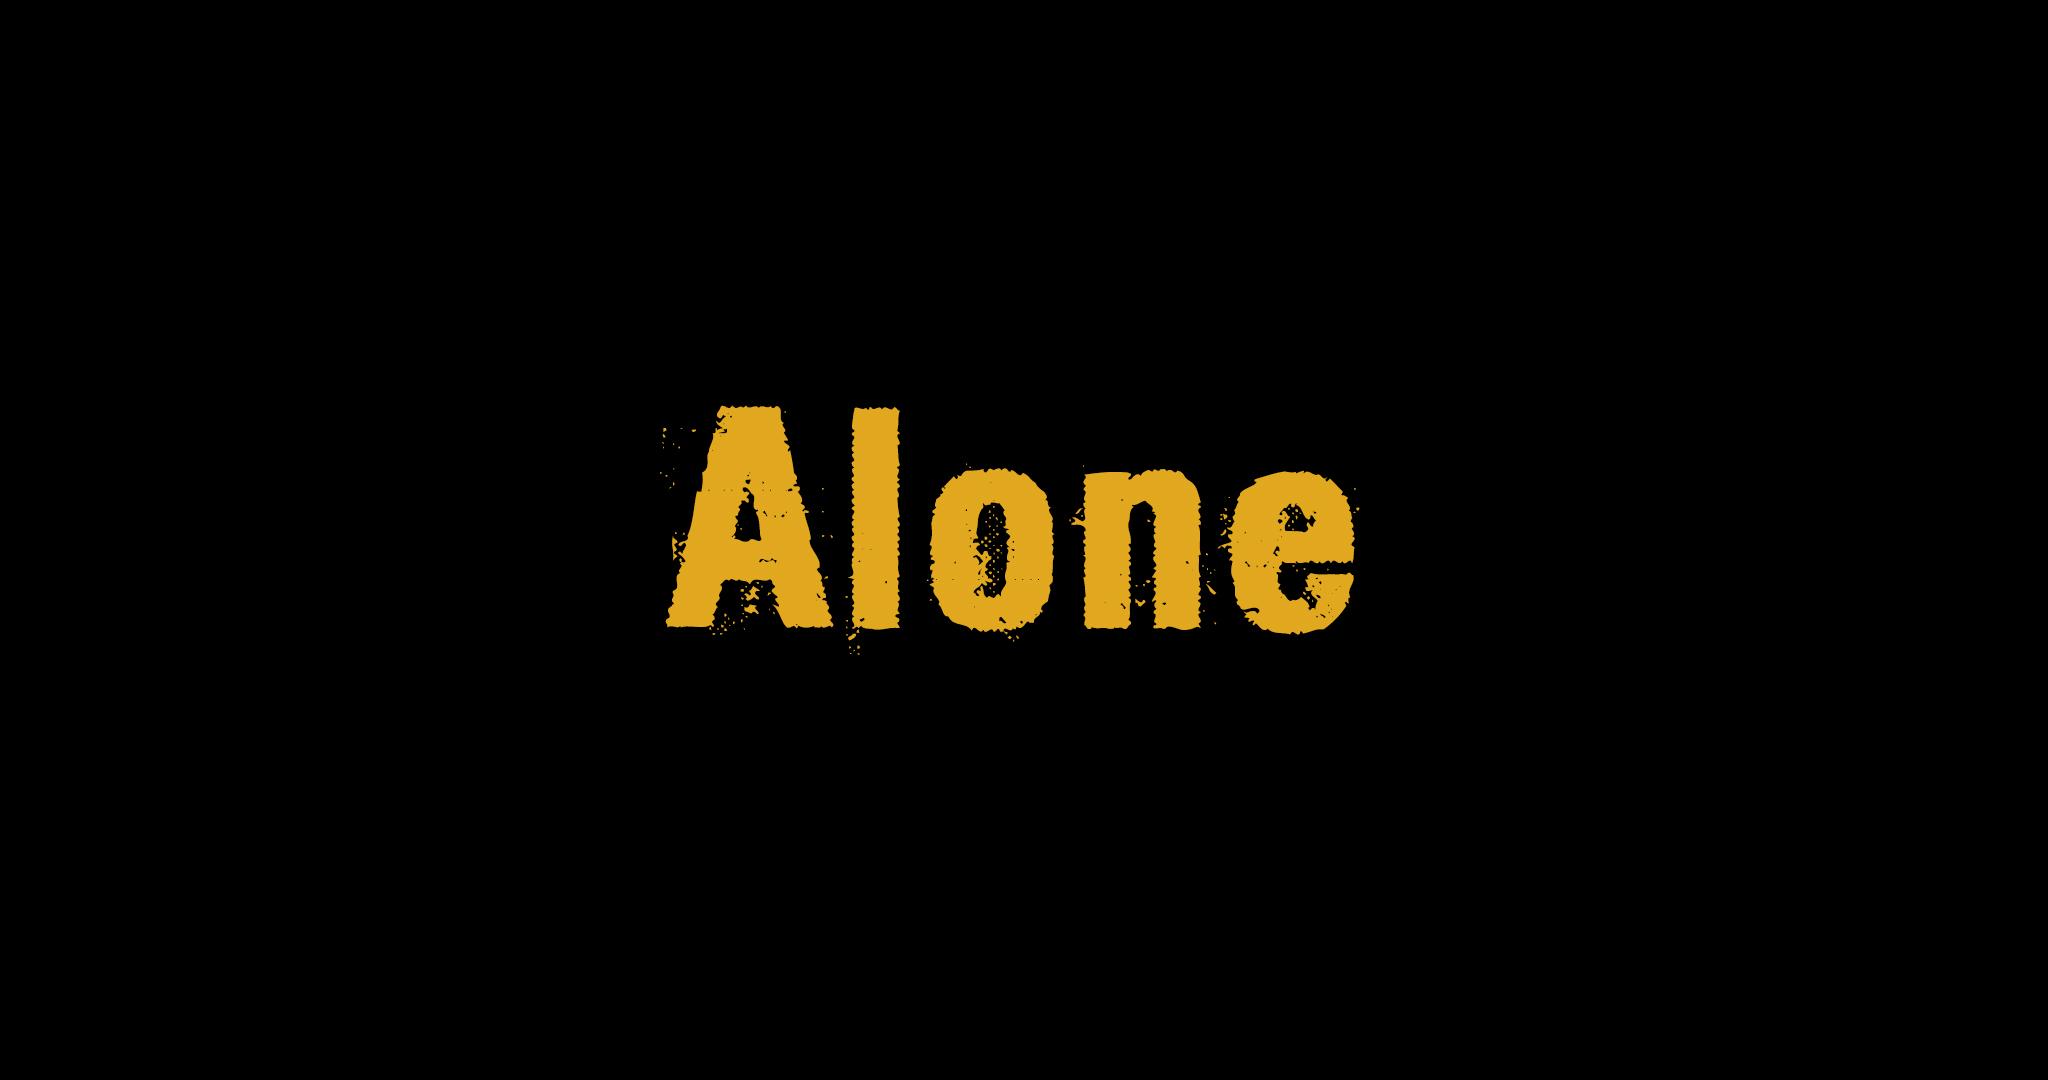 AloneTitle Test5